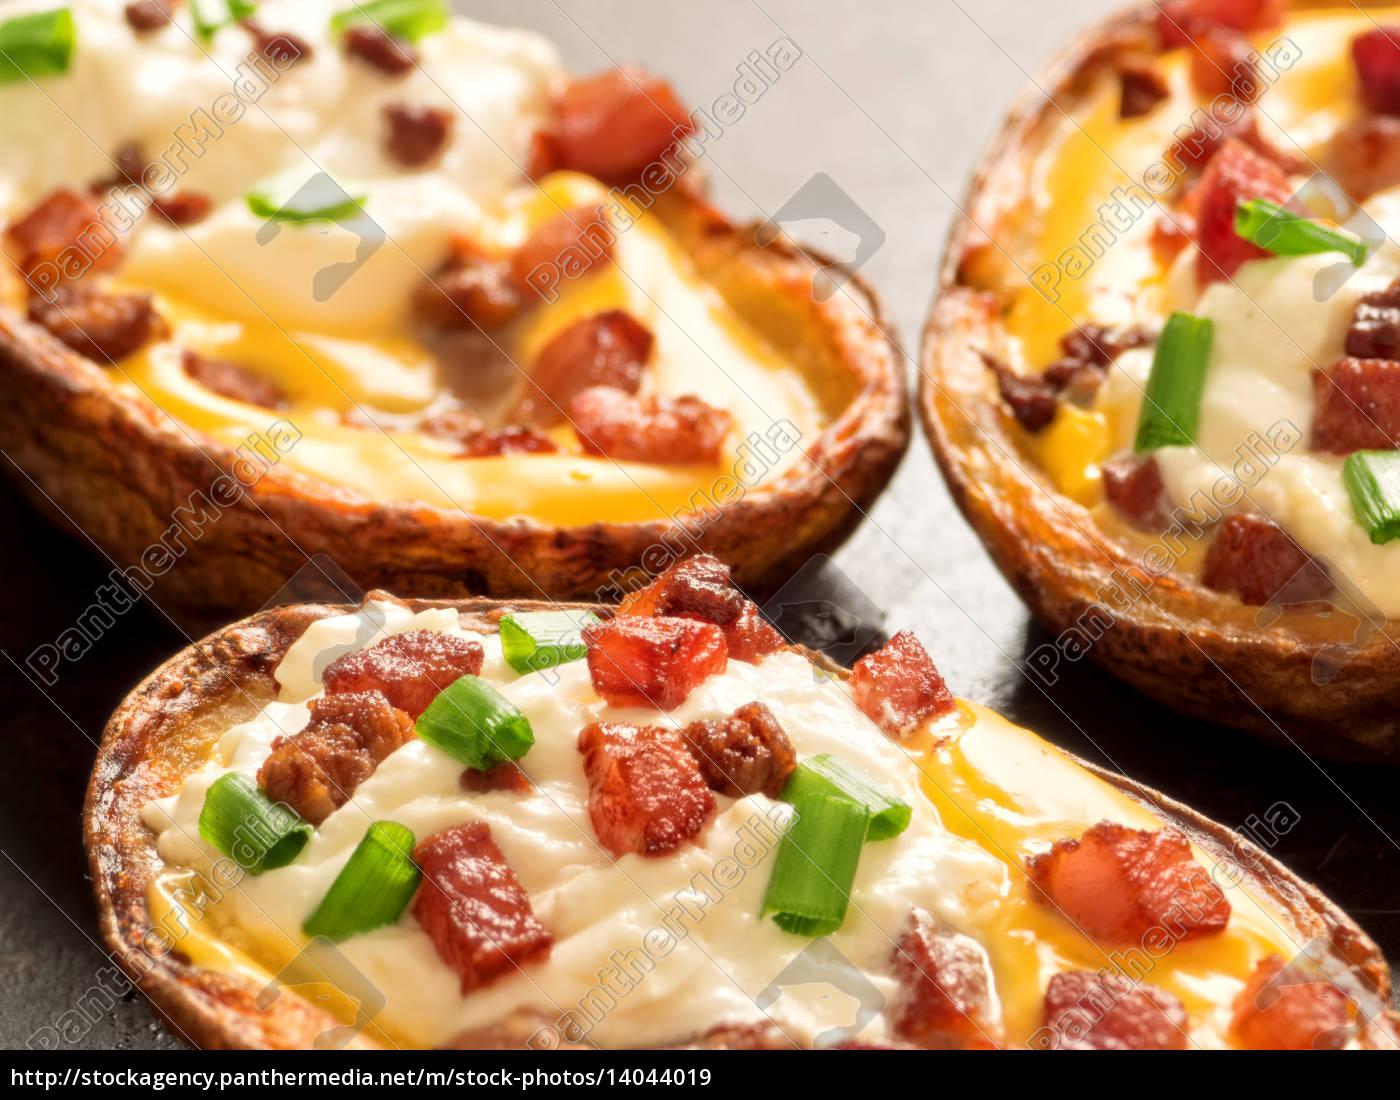 rustic, baked, potato, skin - 14044019